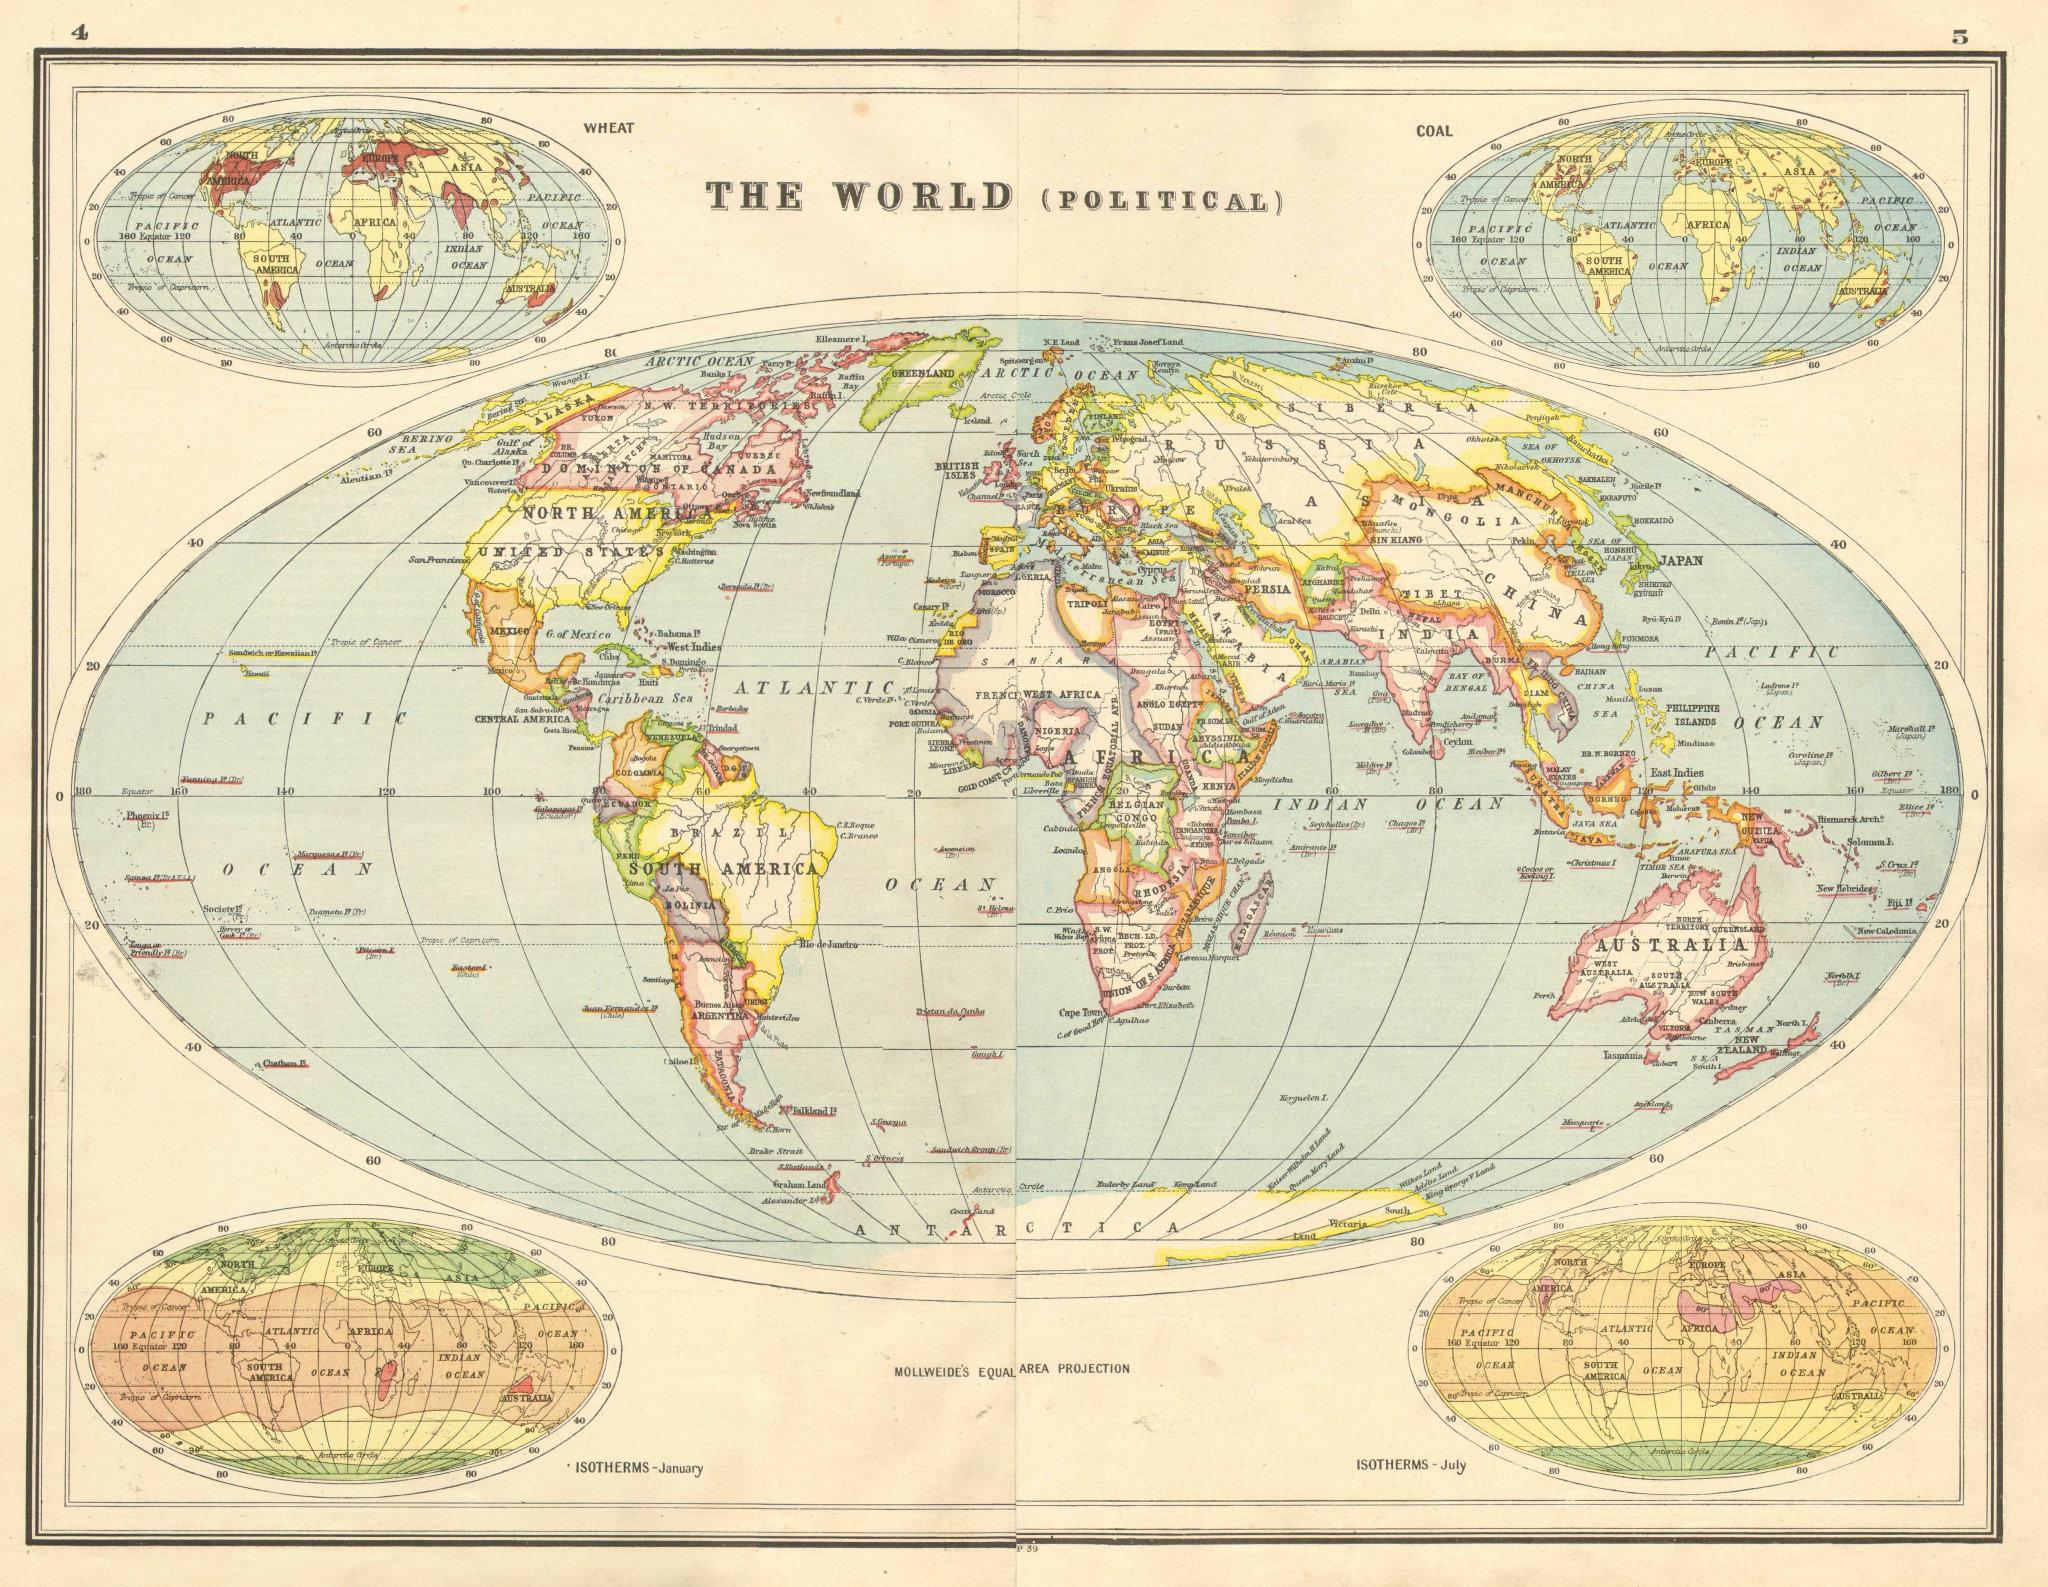 Associate Product WORLD POLITICAL. Hejas Asir British Empire Chosen Rio de Oro Siam 1920 old map